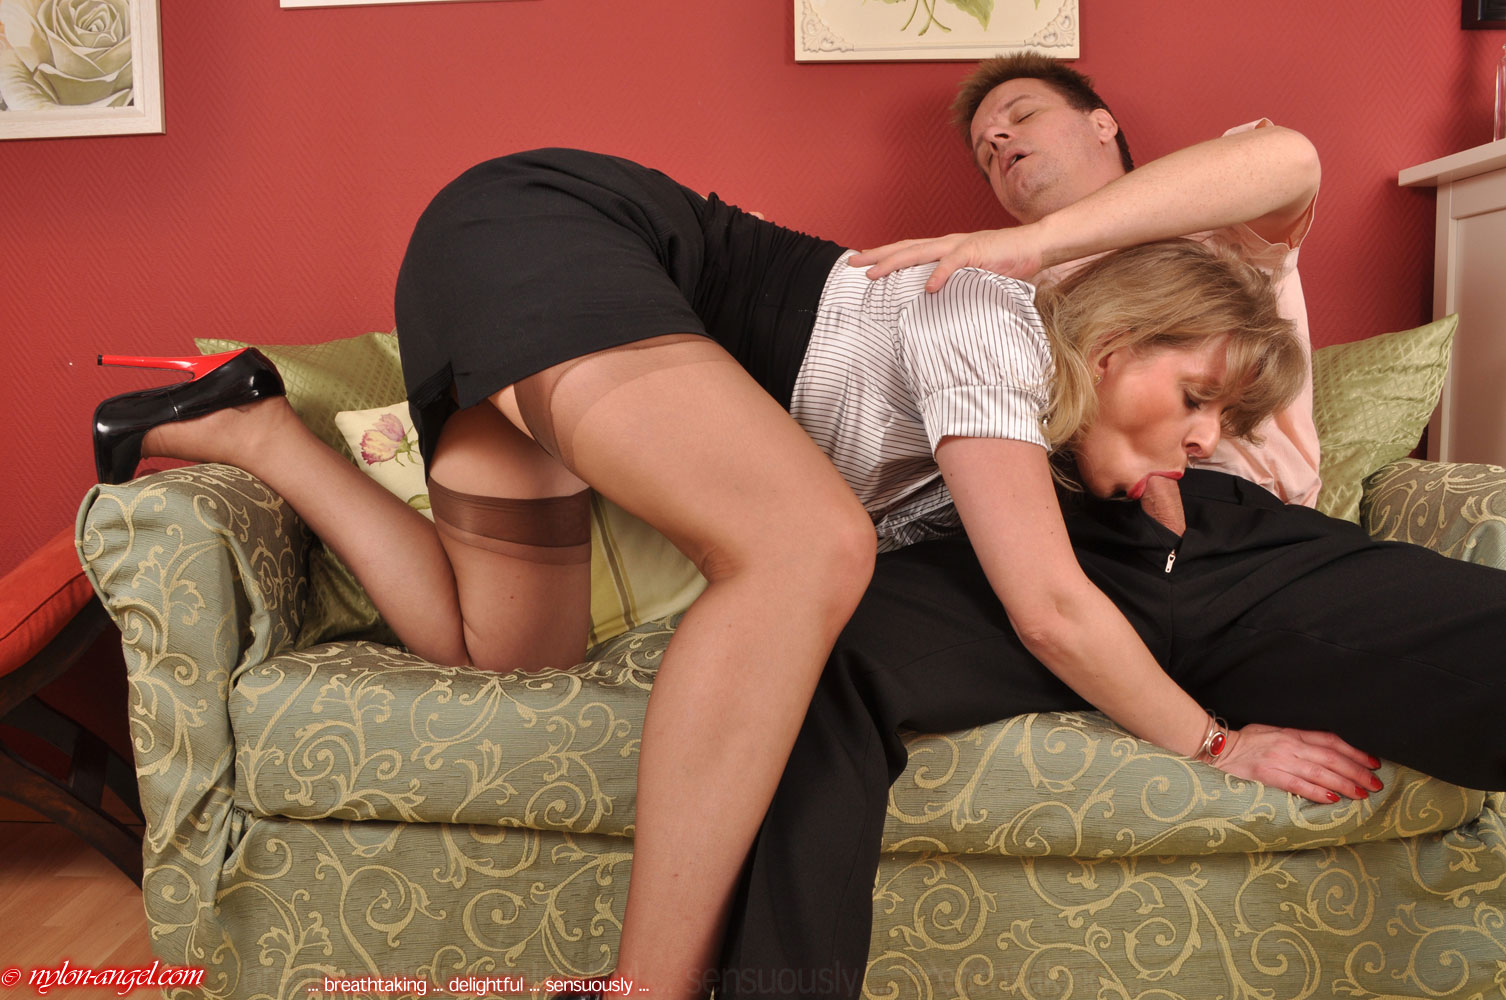 free-video-sex-mams-hot-of-nylon-slut-sex-tube-videotures